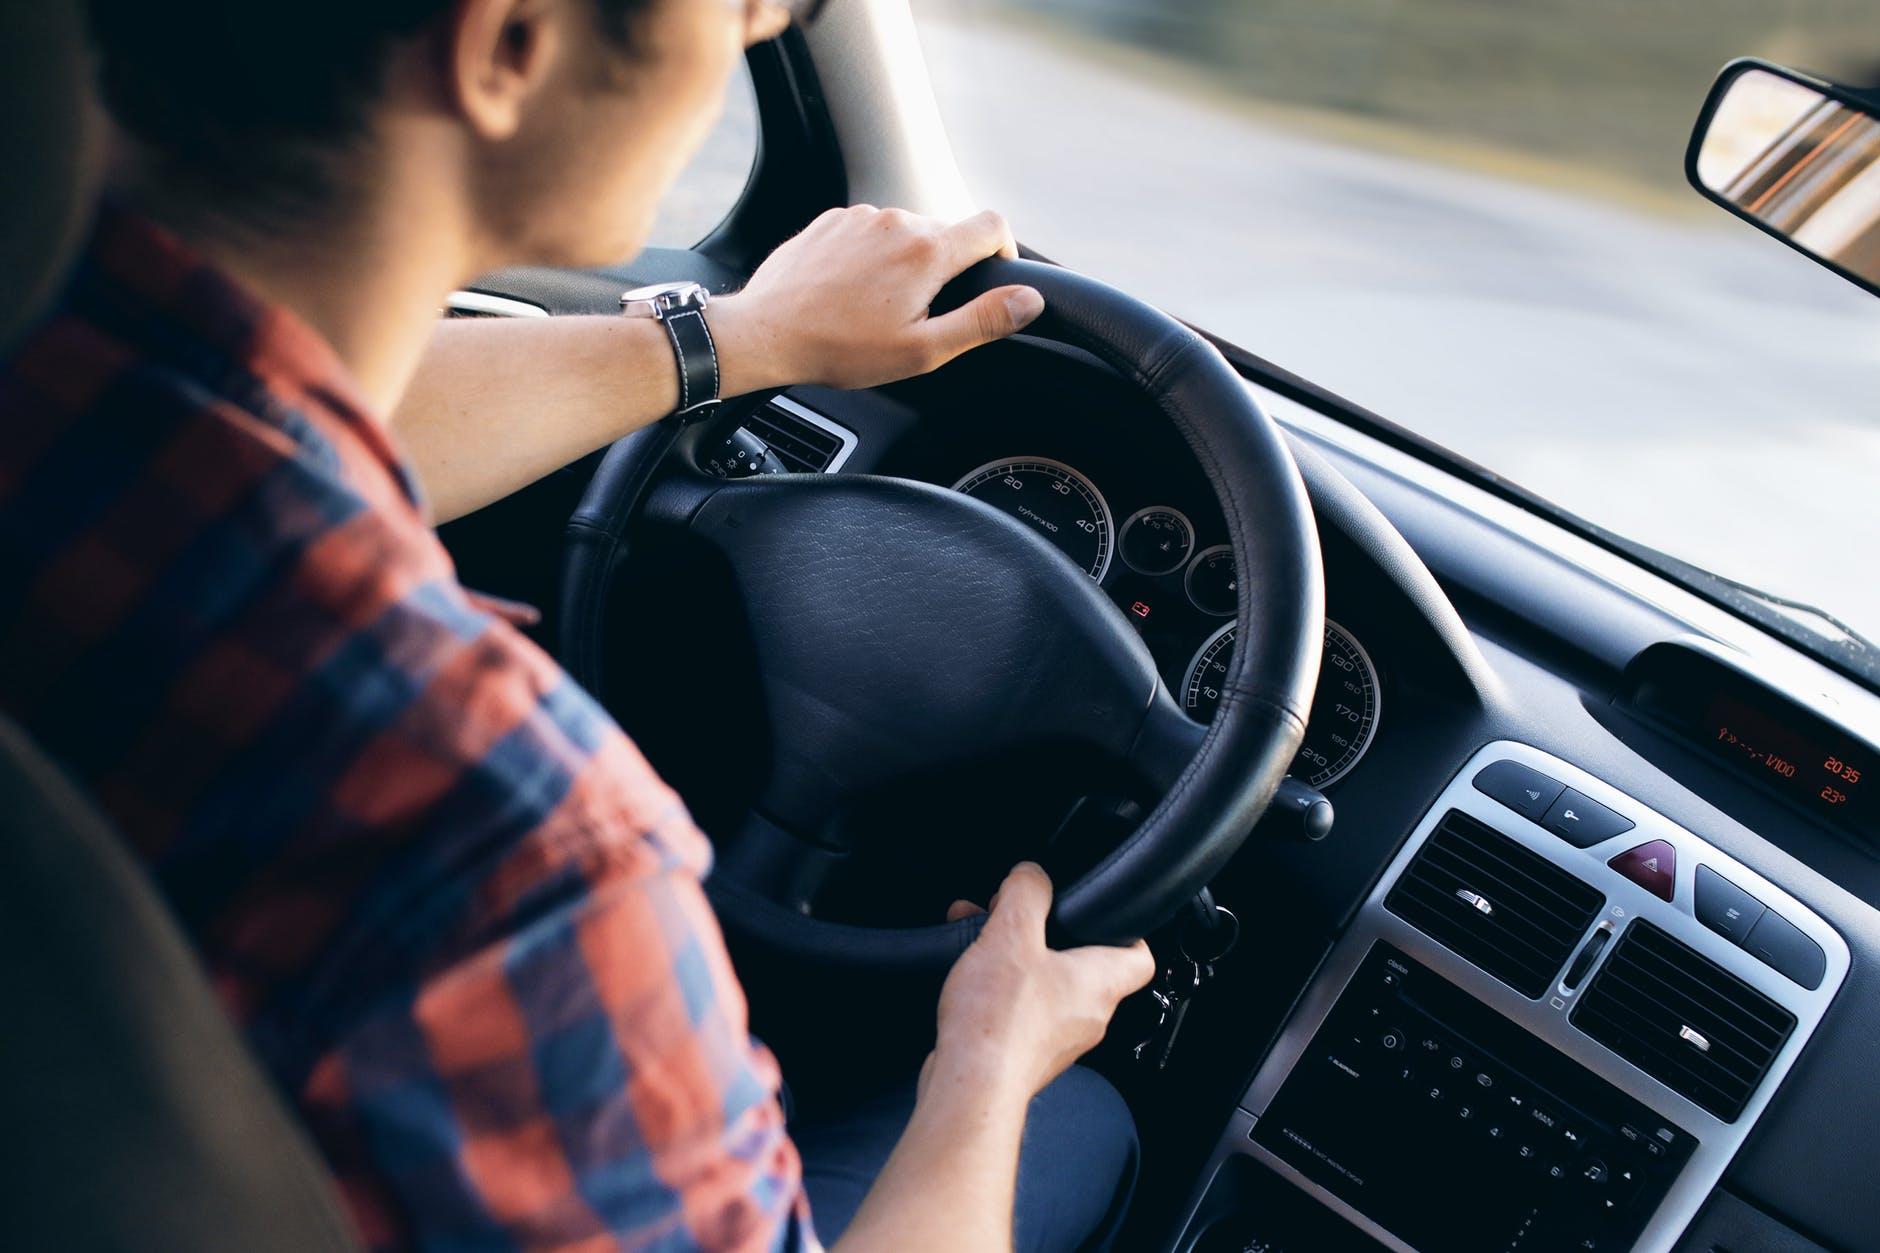 Why You Shouldn't Drive if You Feel Sleepy